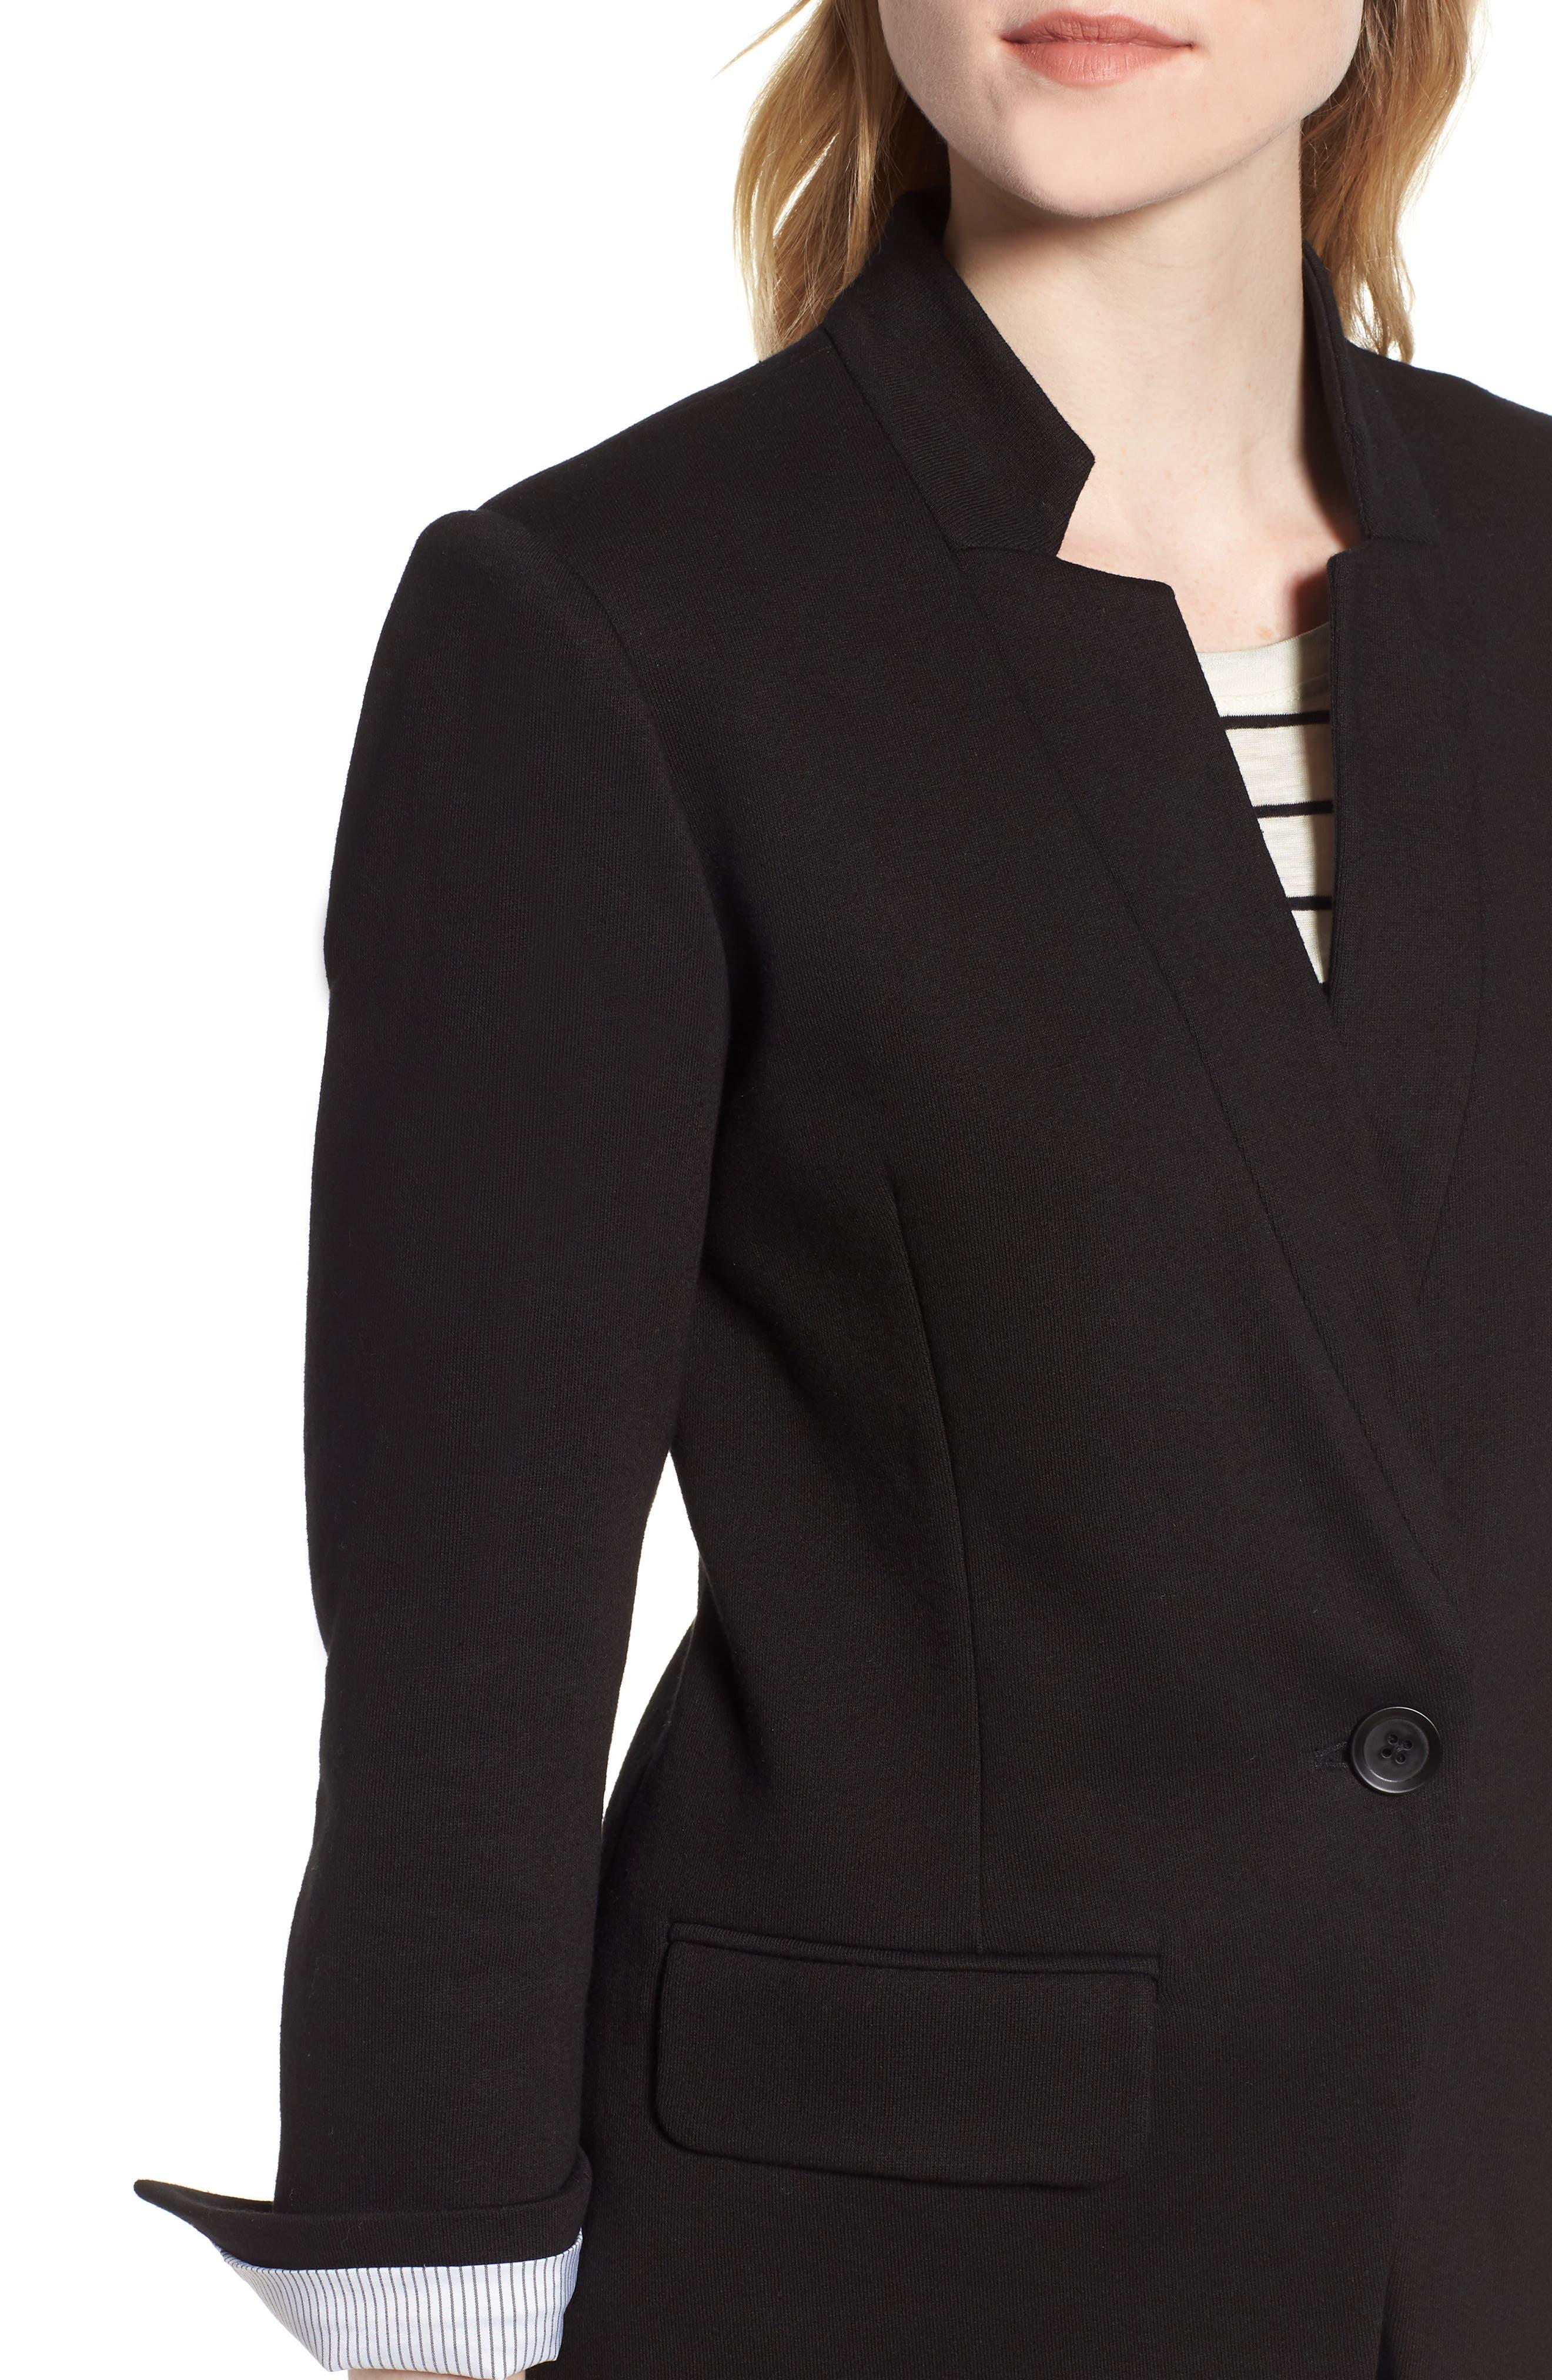 Cotton Blend Knit Blazer,                             Alternate thumbnail 4, color,                             Black